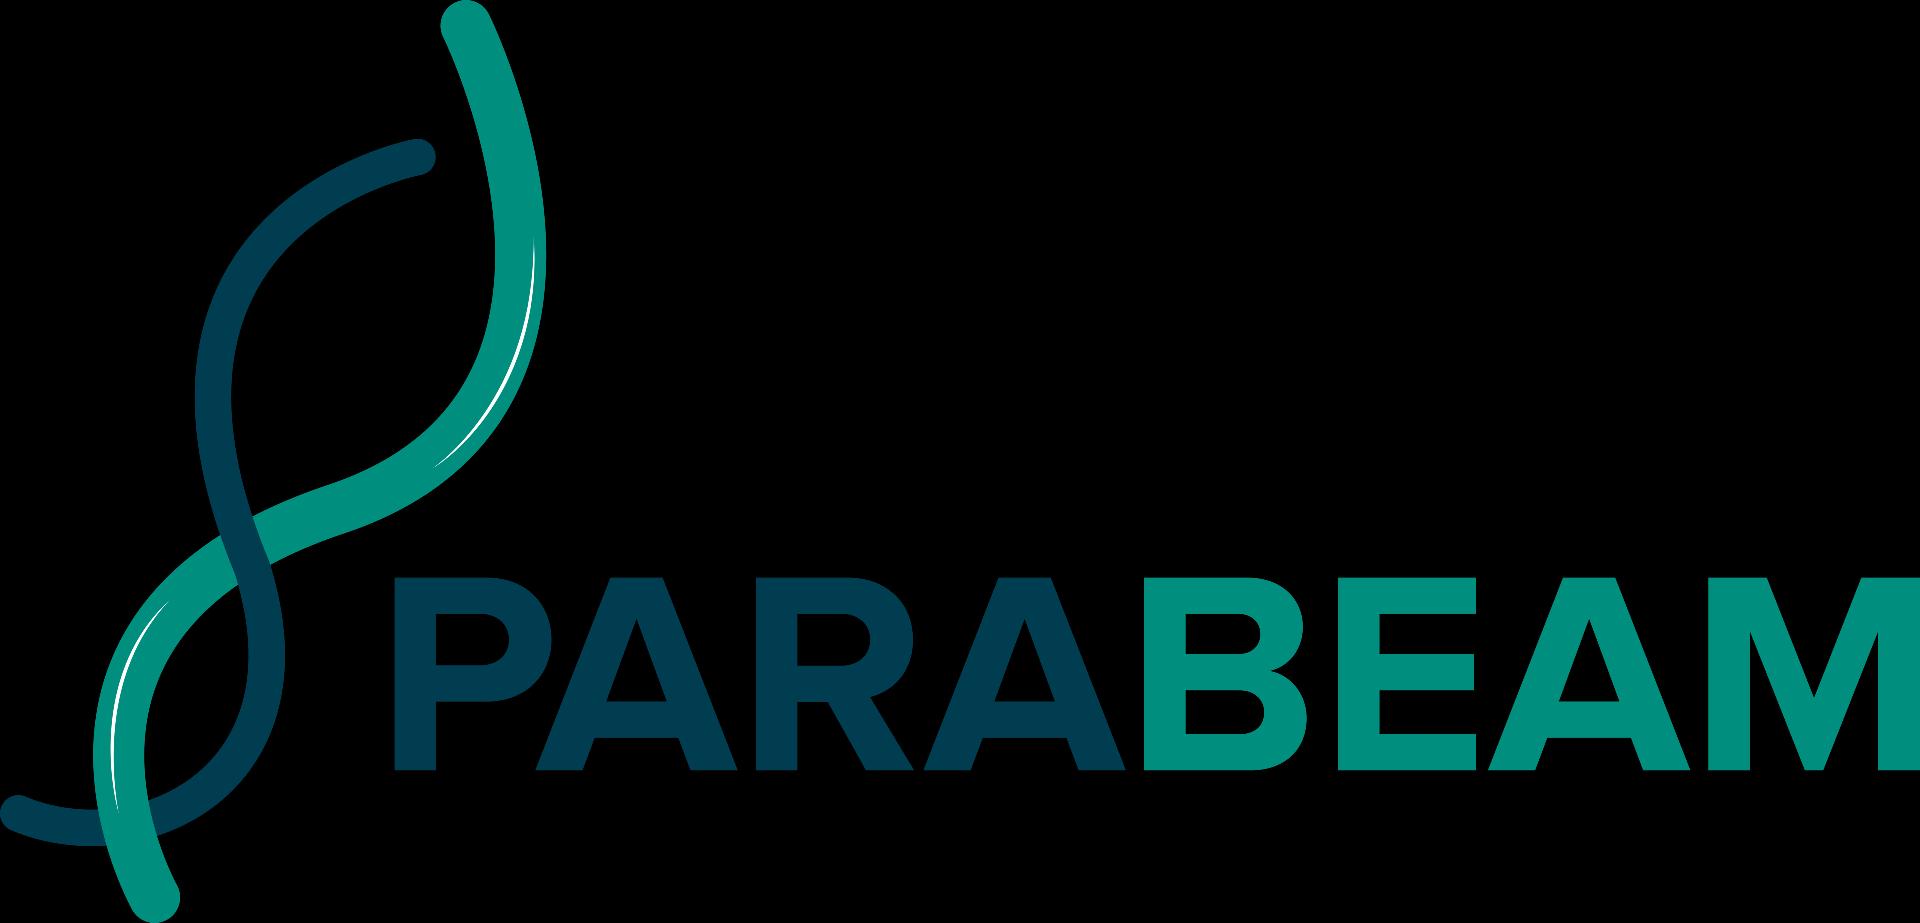 Parabeam